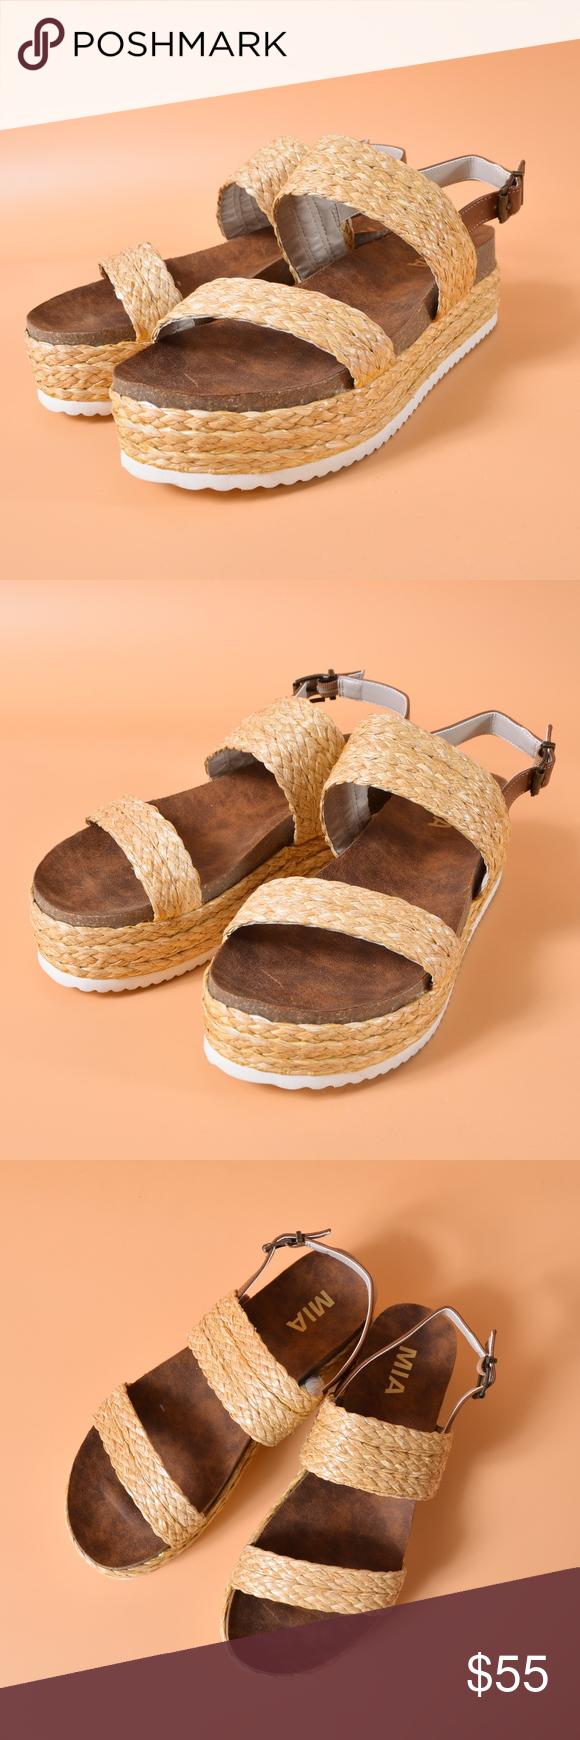 be42978c94f MIA Ava Raffia Platform Sandal New with out tag. raffia-wrapped toe strap -